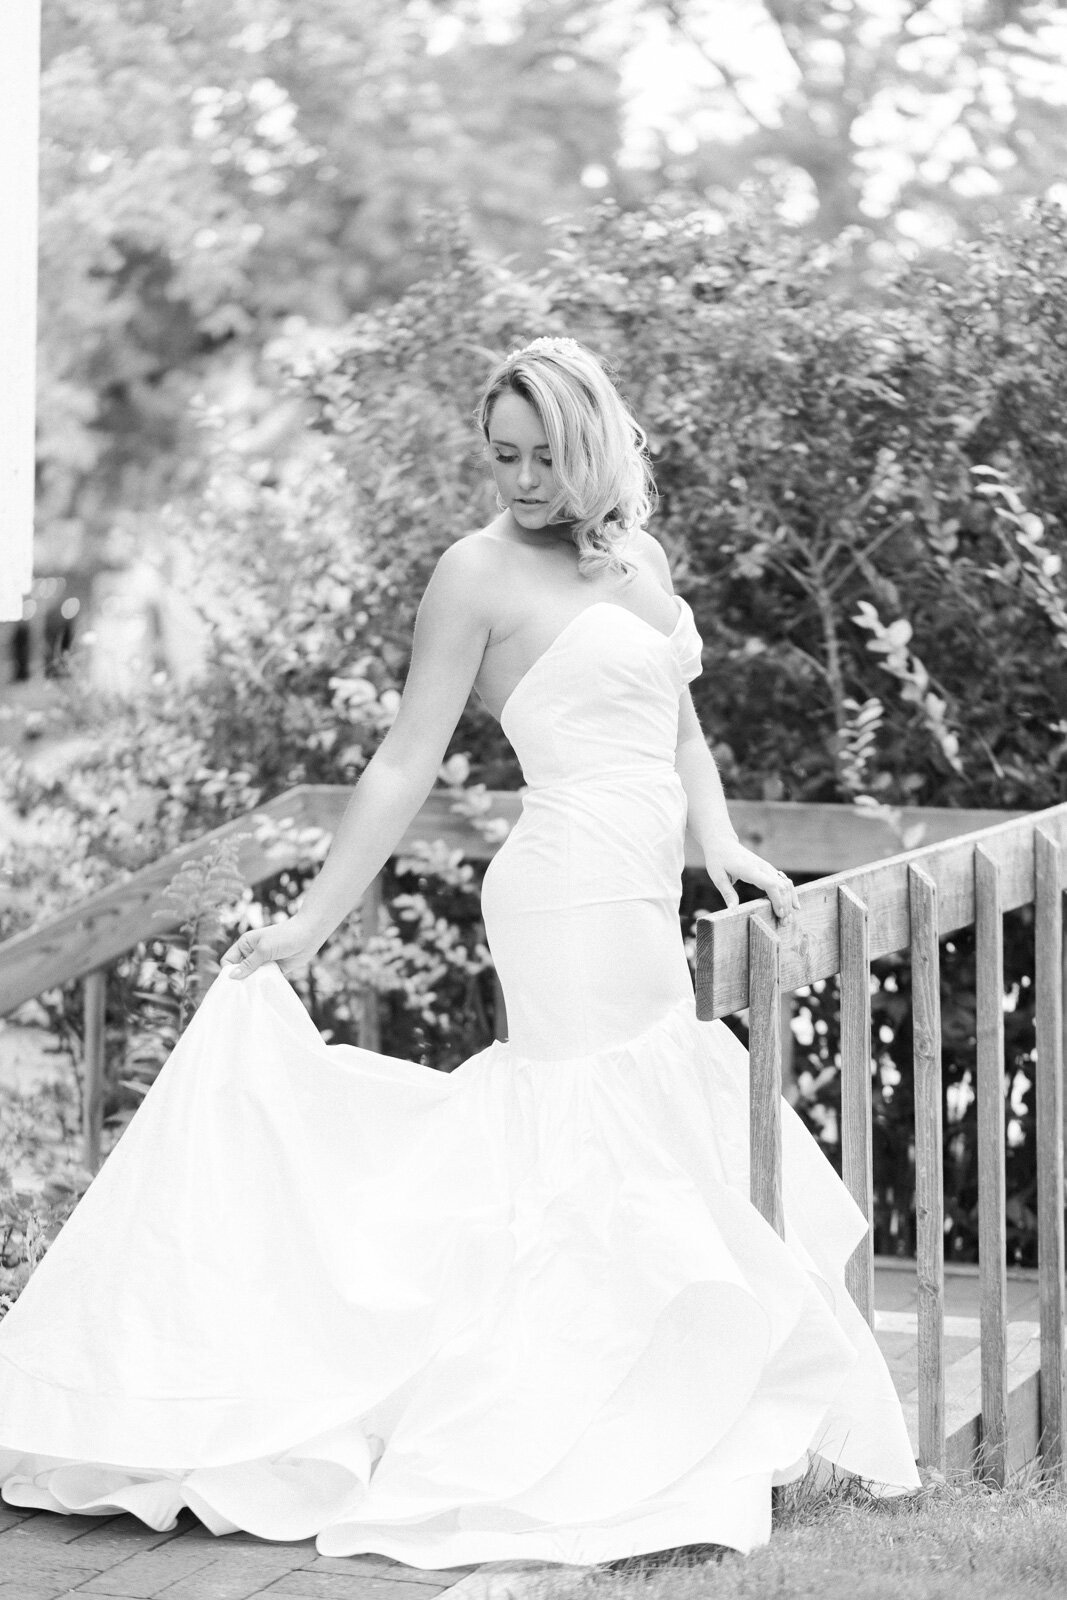 C098765 leveland+Wedding+Dress+Boutique,+Radiant+Bride+by+Cleveland+Wedding+Photographer+Matt+Erickson+Photography.jpg